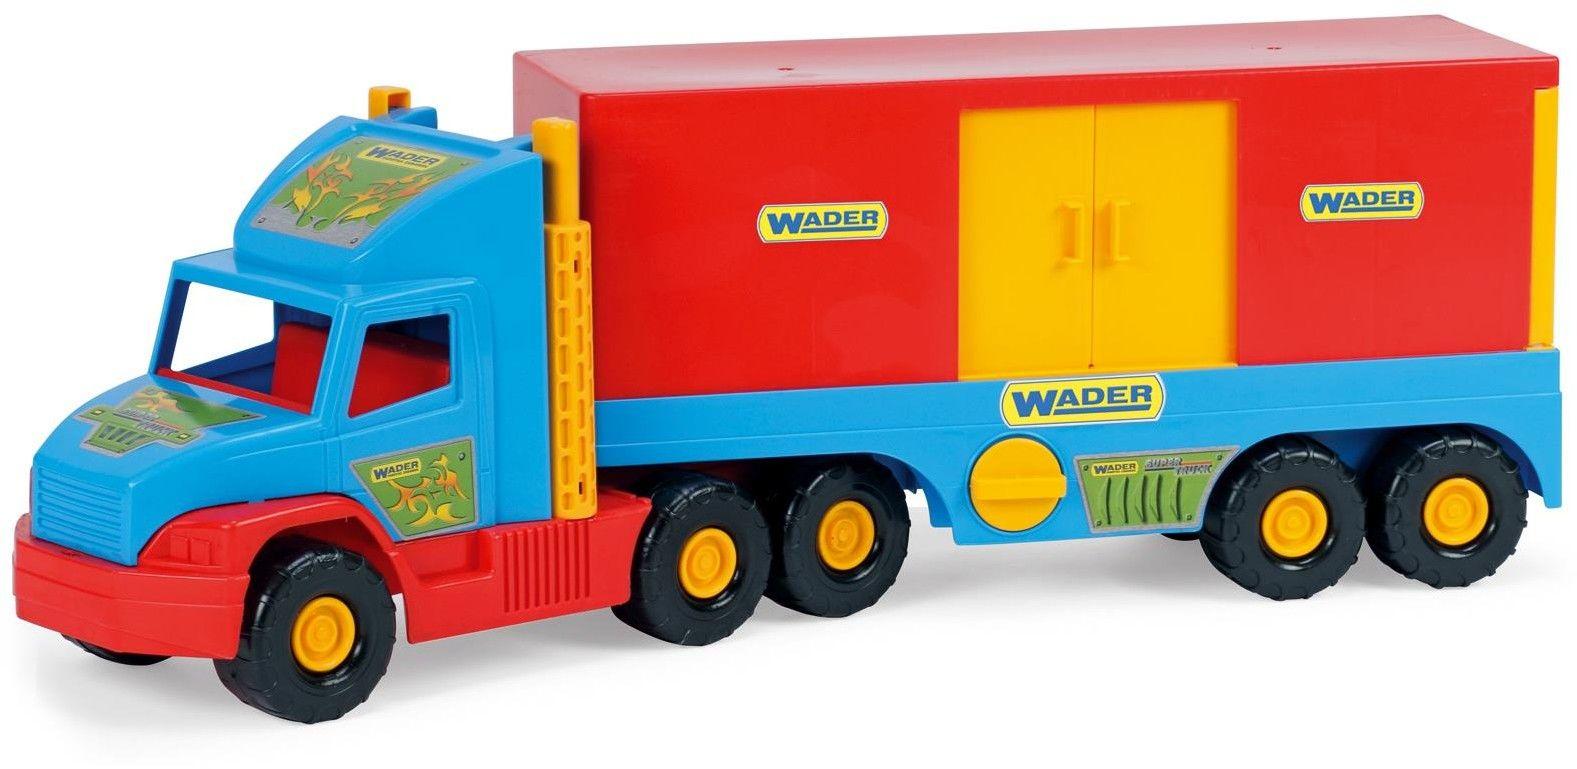 Wader 36510 - Super Truck kontener